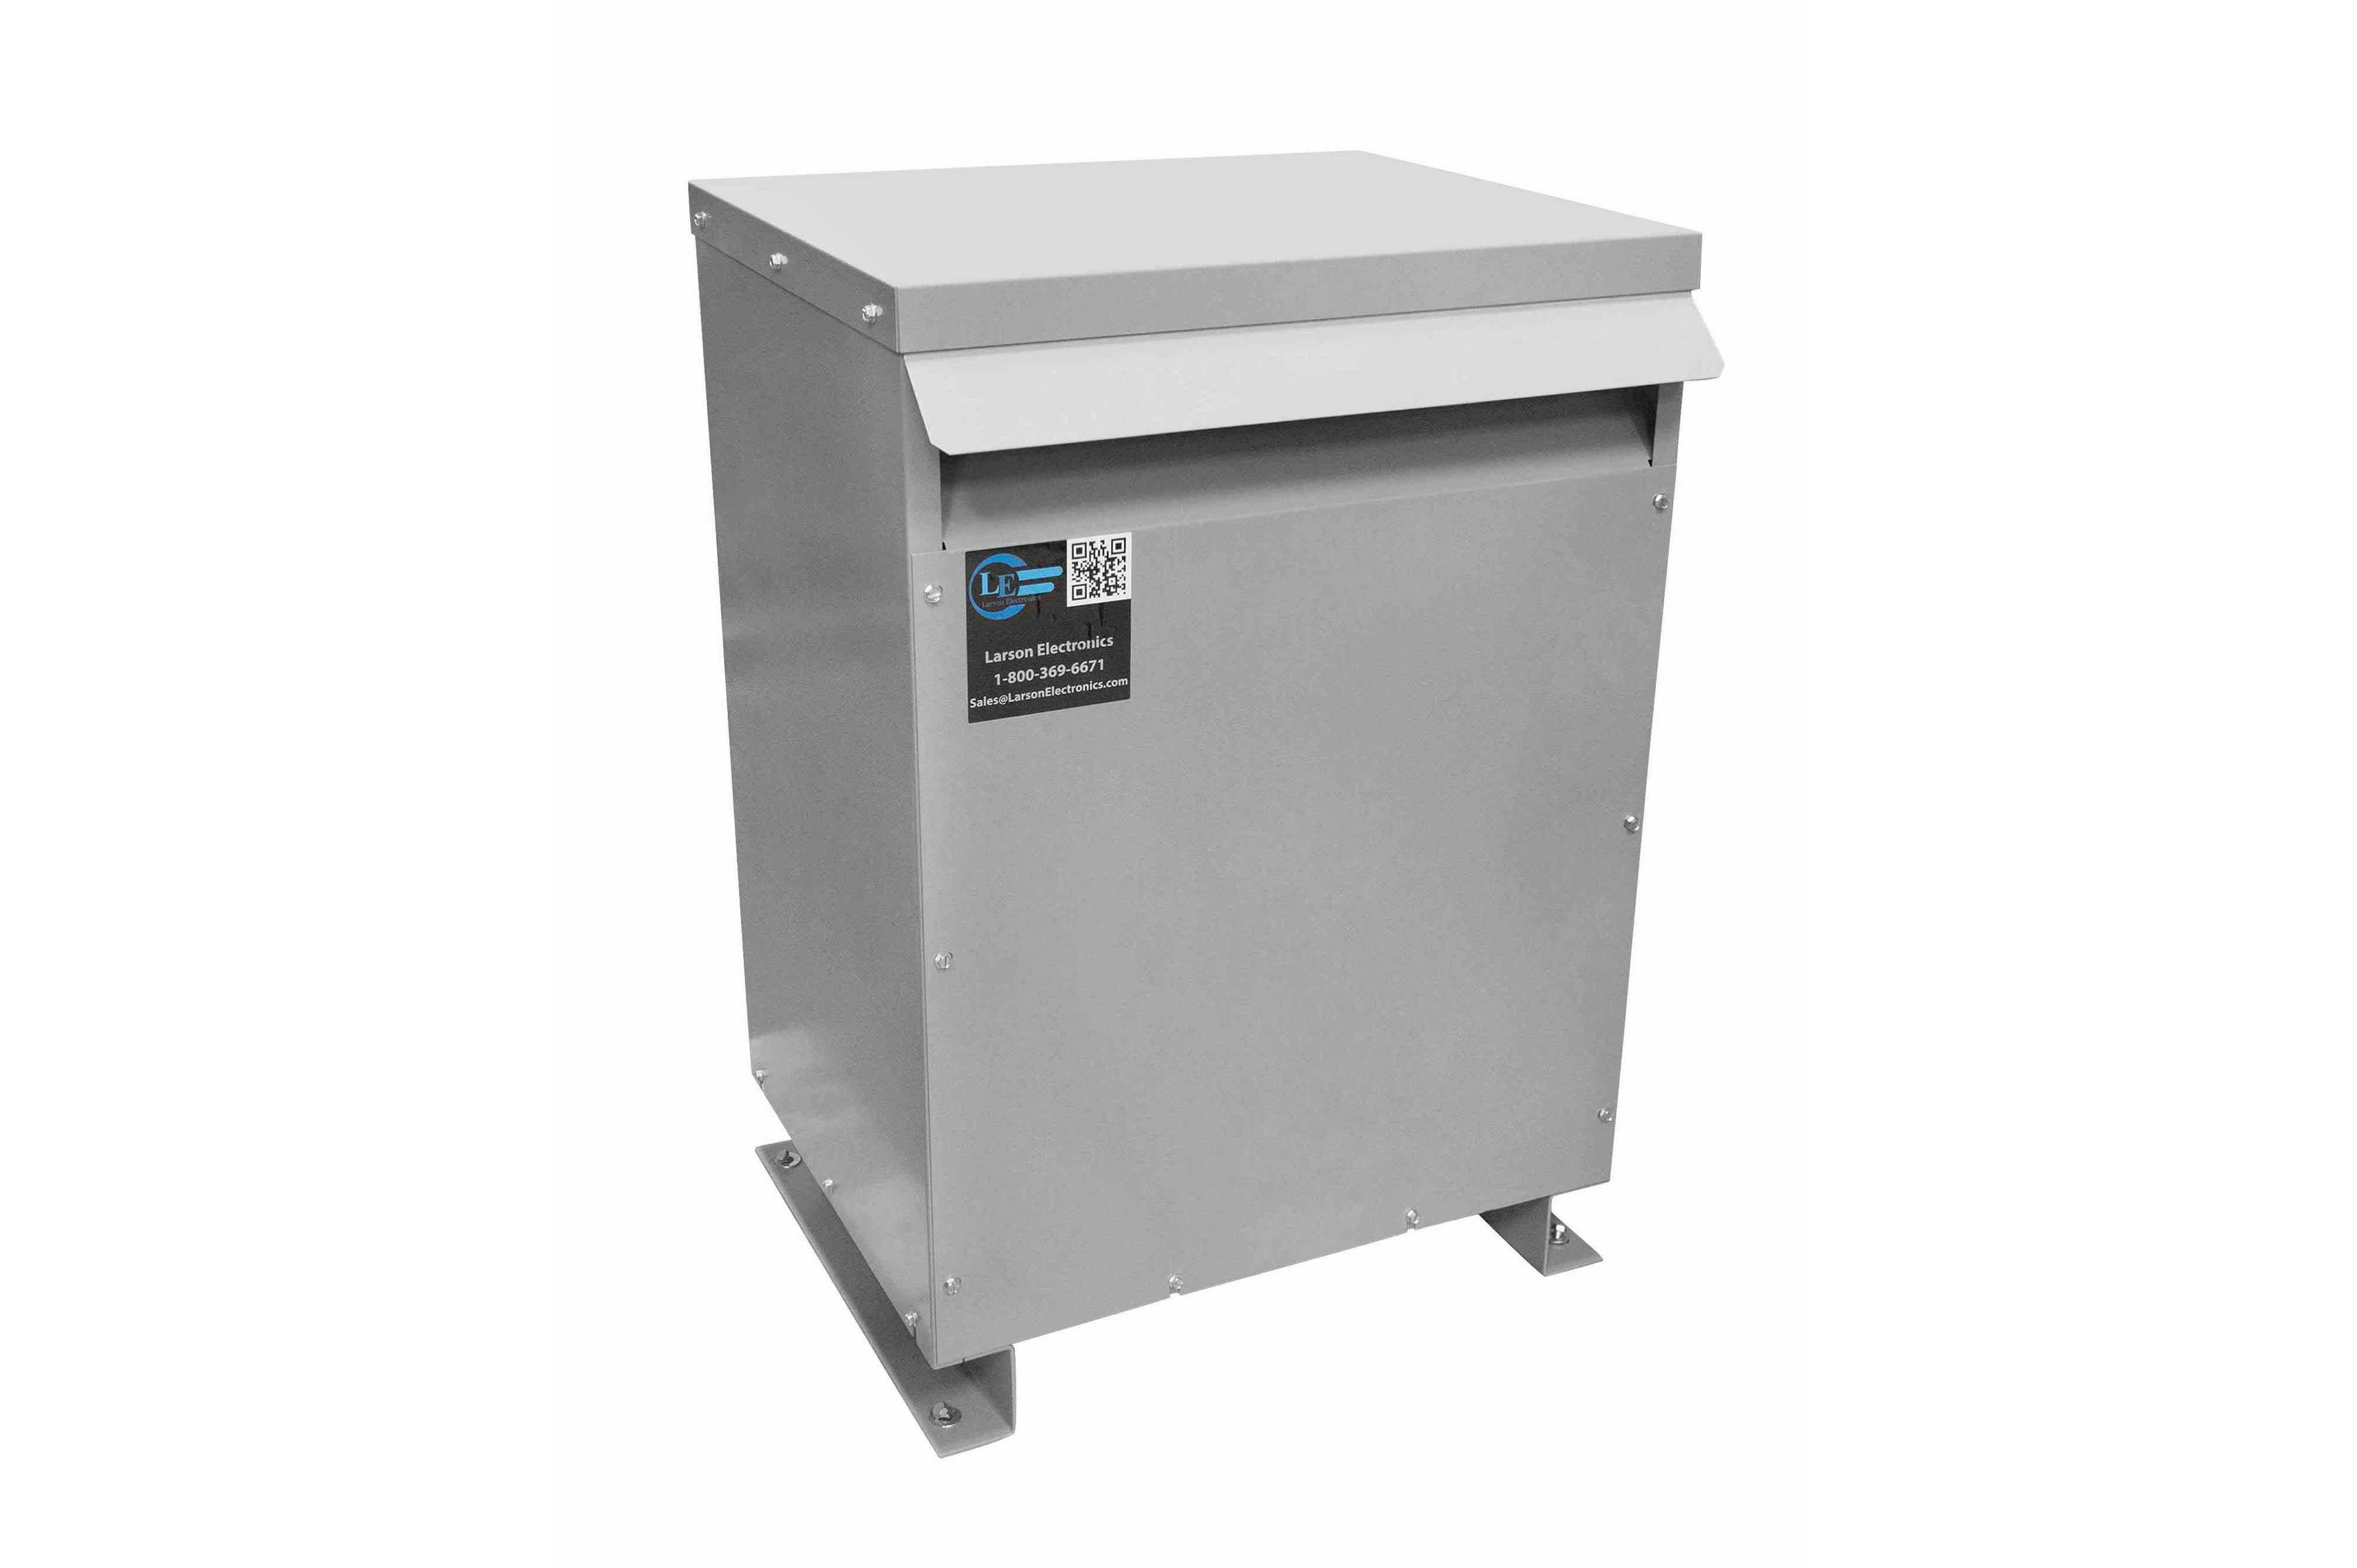 110 kVA 3PH Isolation Transformer, 380V Wye Primary, 600V Delta Secondary, N3R, Ventilated, 60 Hz